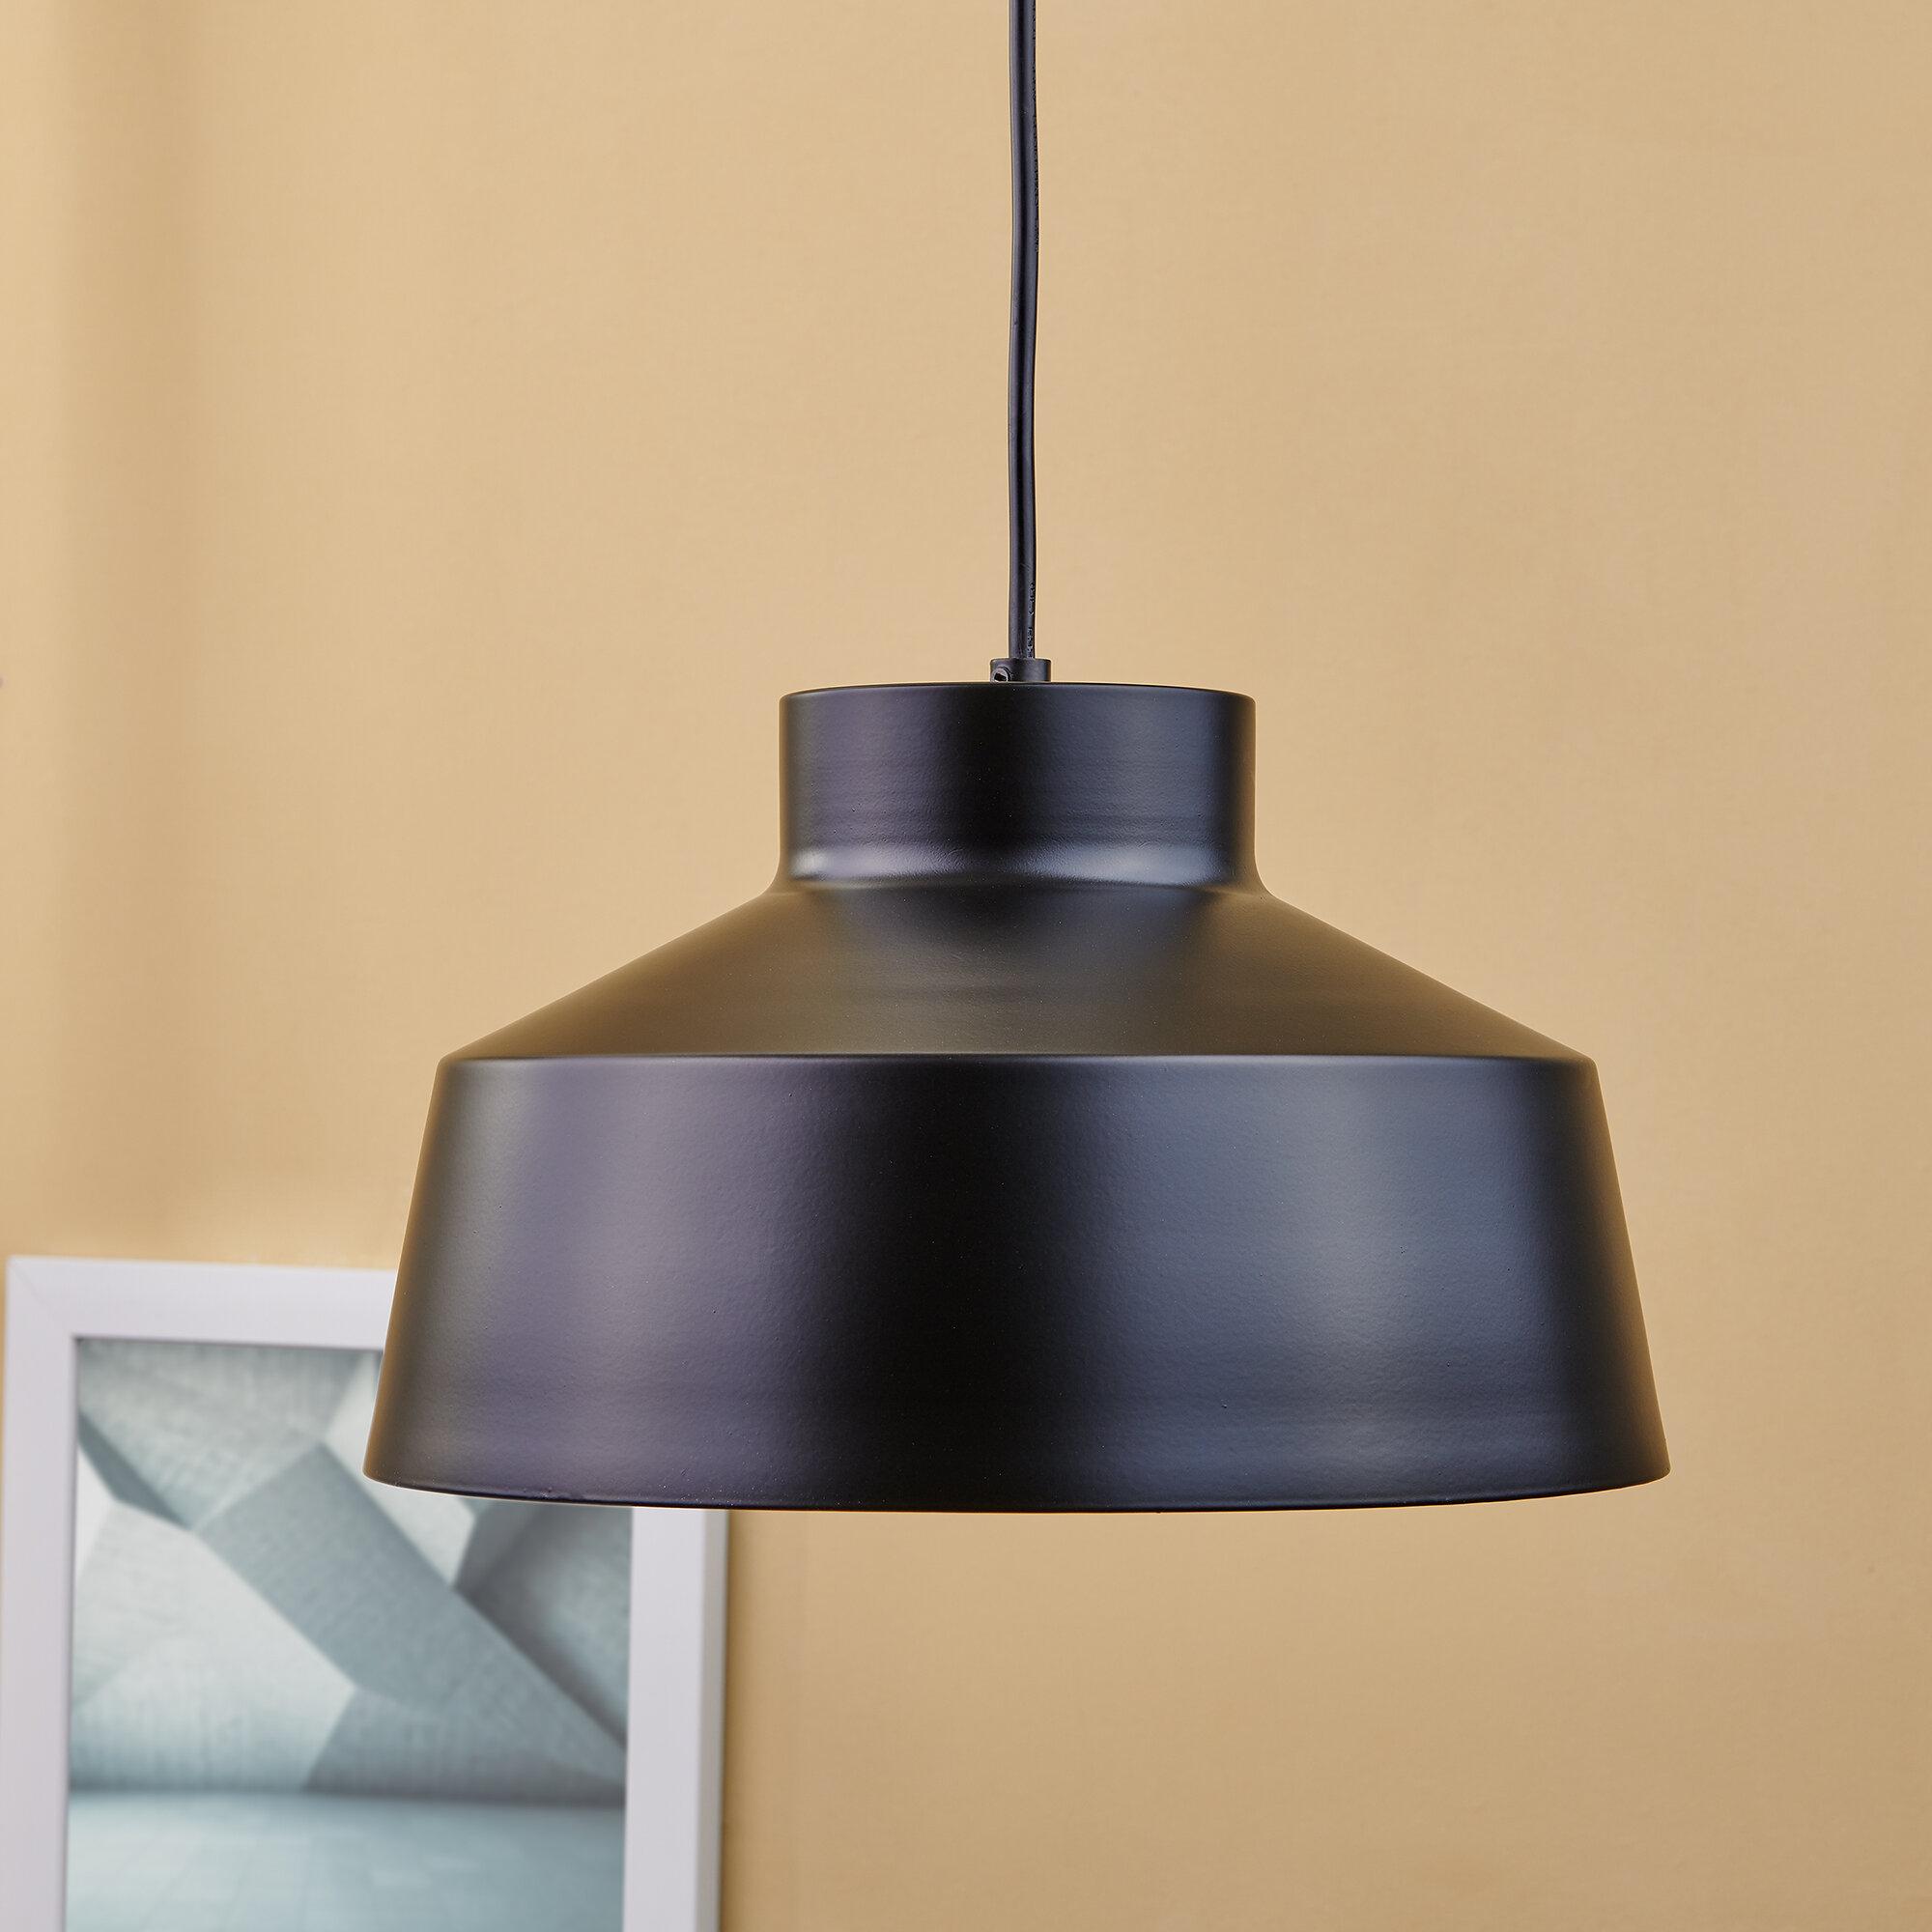 Oversized Dome Pendant Light | Wayfair with Monadnock 1-Light Single Dome Pendants (Image 24 of 30)